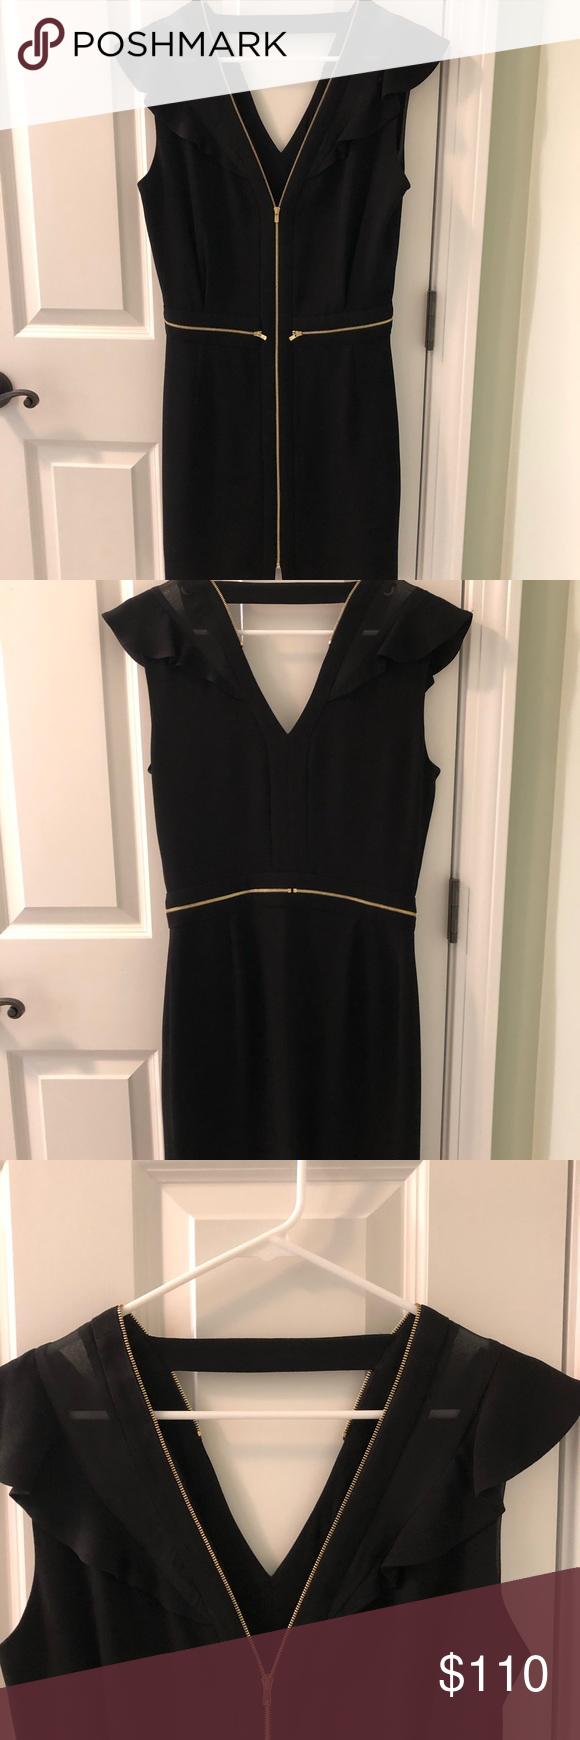 Sandro Paris Black Dress With Gold Accents M Clothes Design Black Dress Little Black Dress [ 1740 x 580 Pixel ]